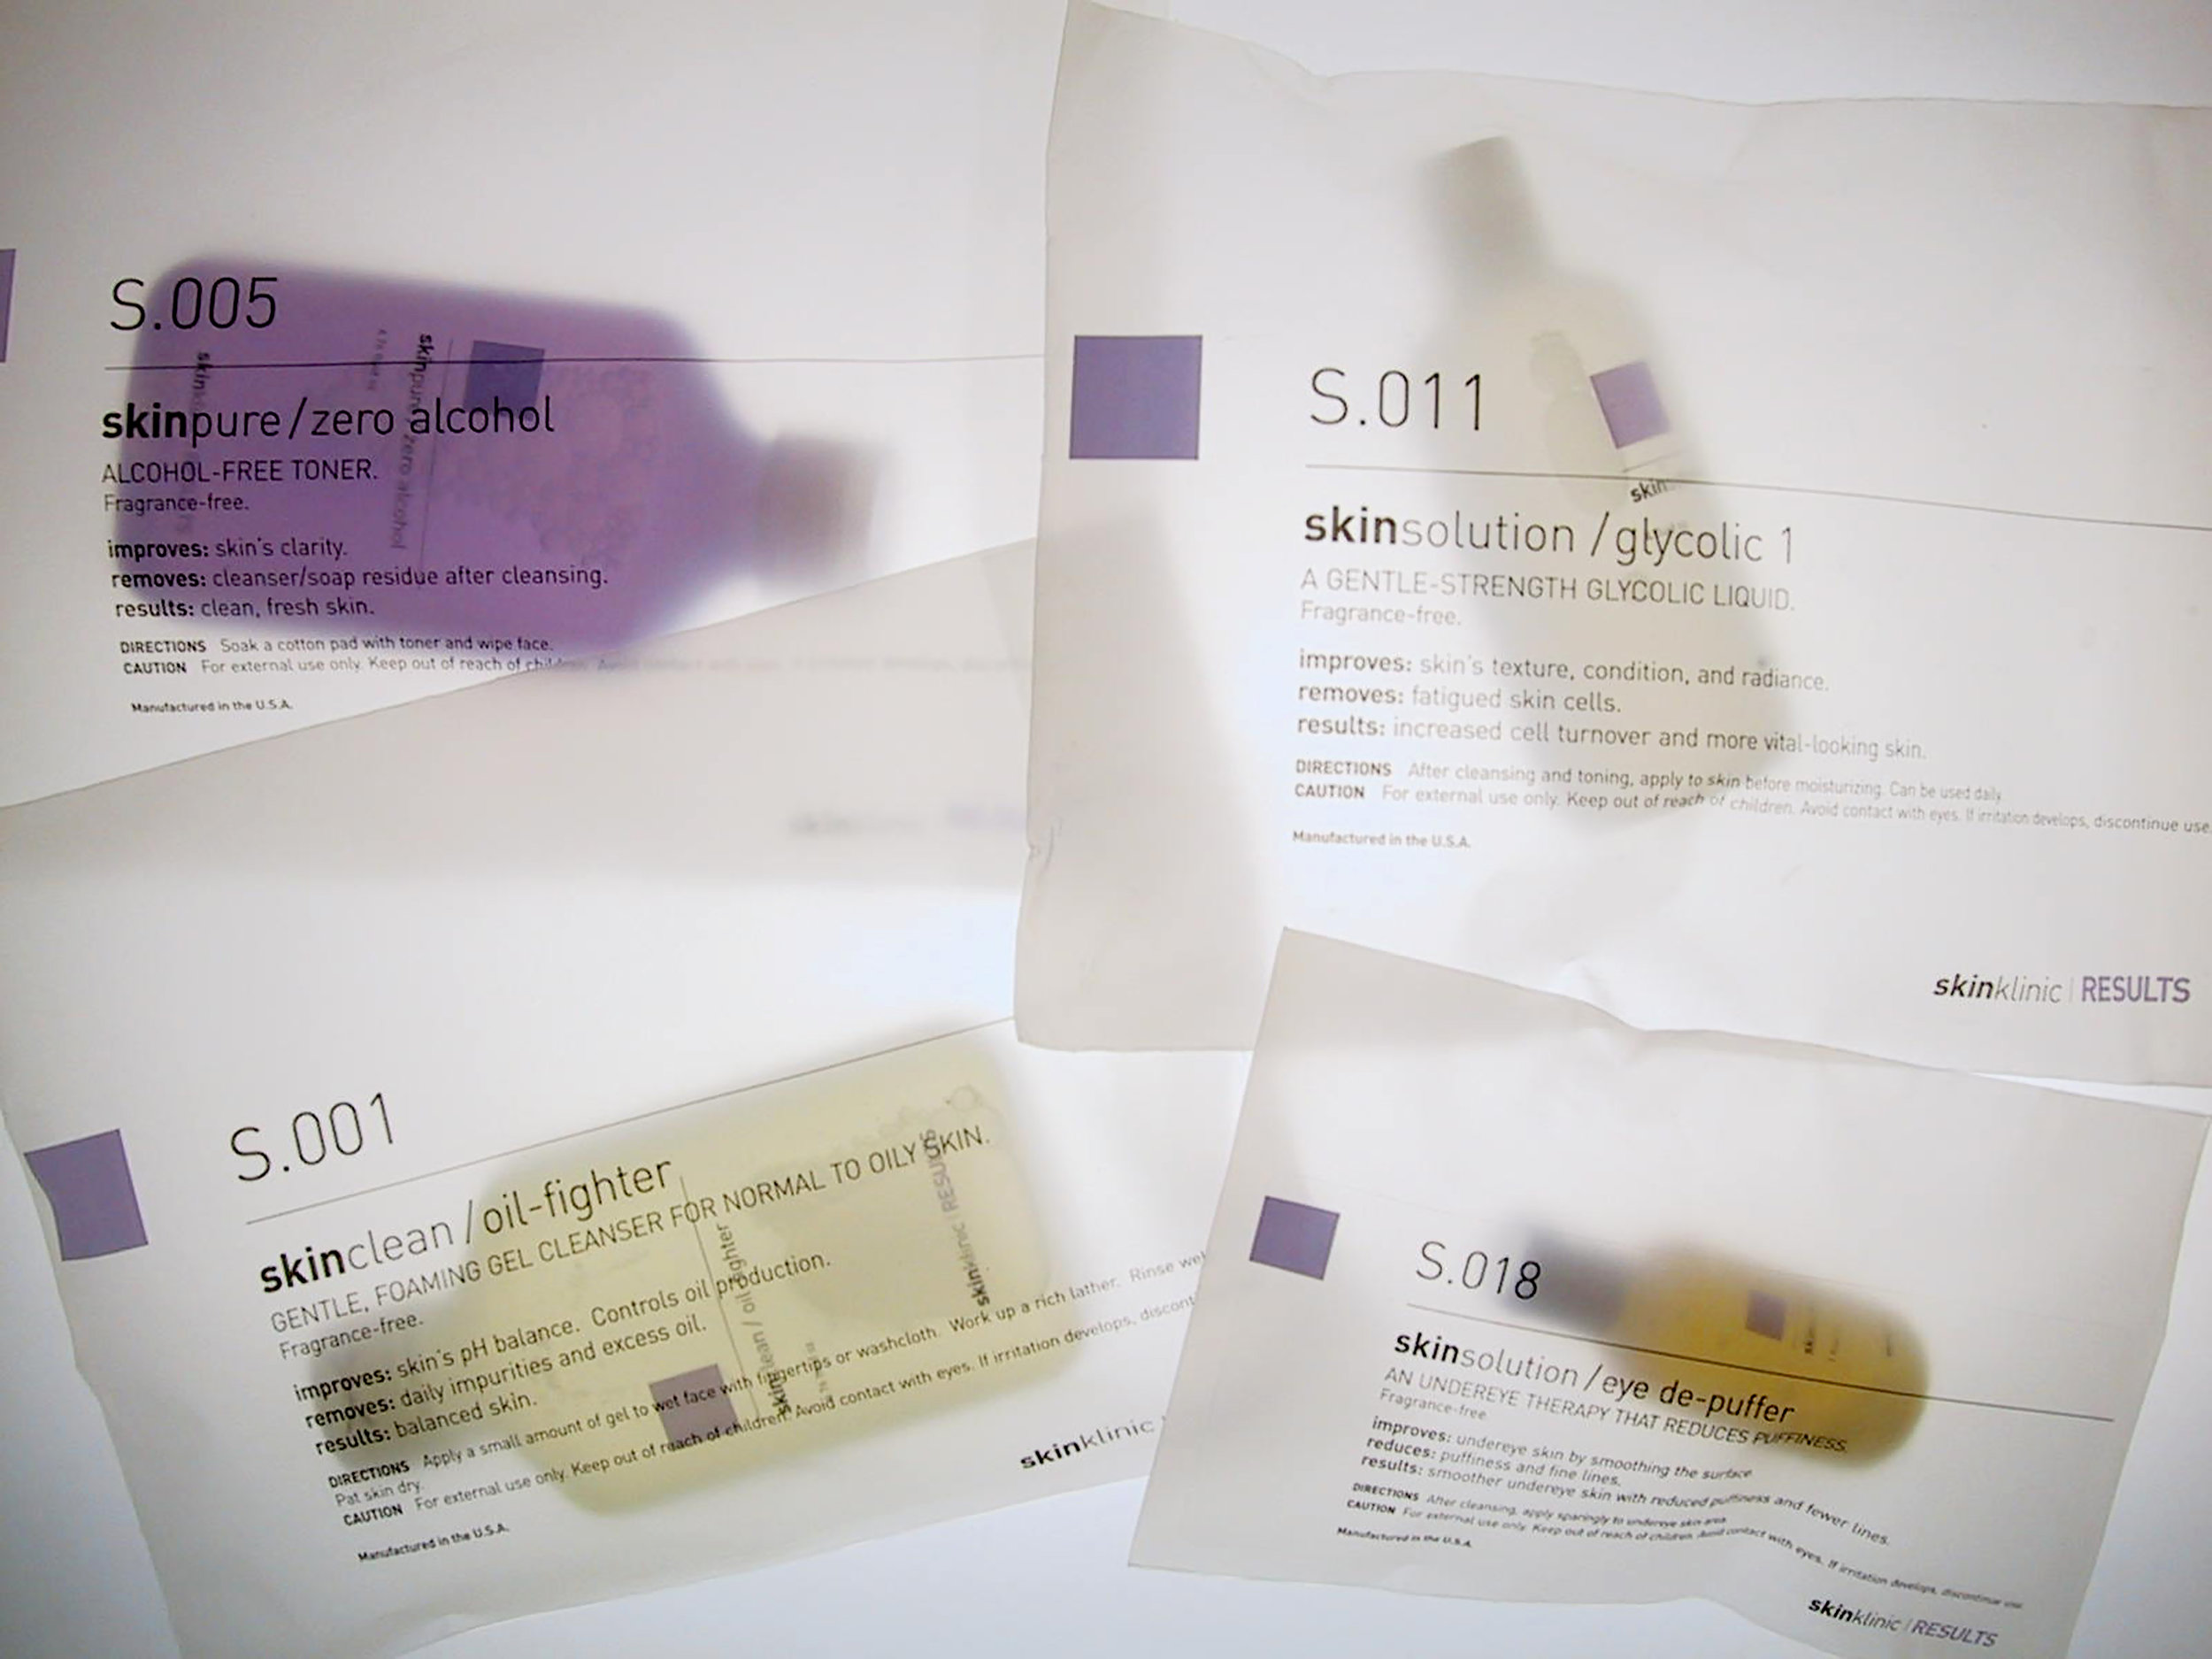 Skinklinic_4.jpg